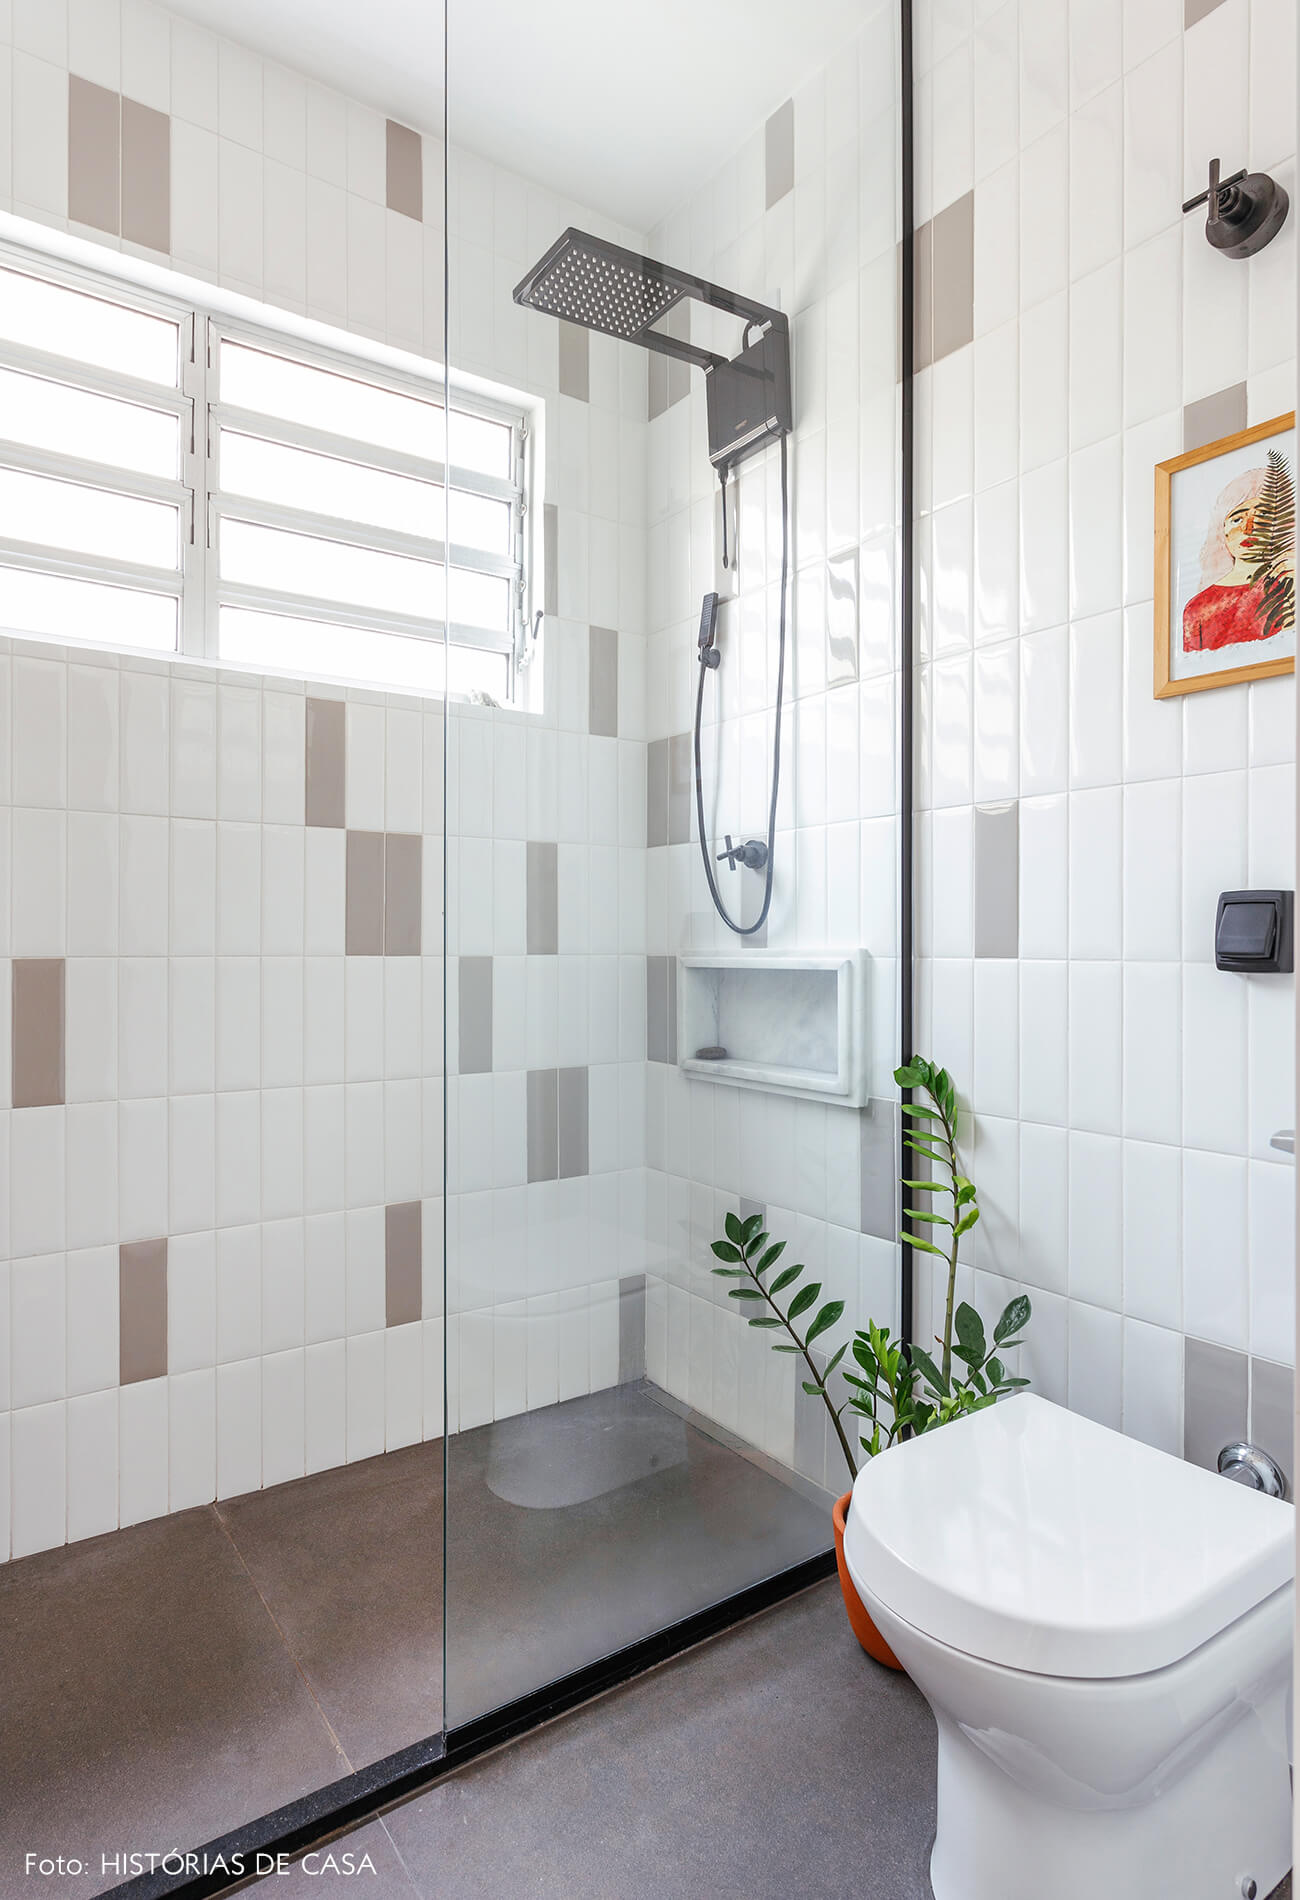 Antes e depois reforma de banheiro, novos revestimentos, subway tile cinza e branco